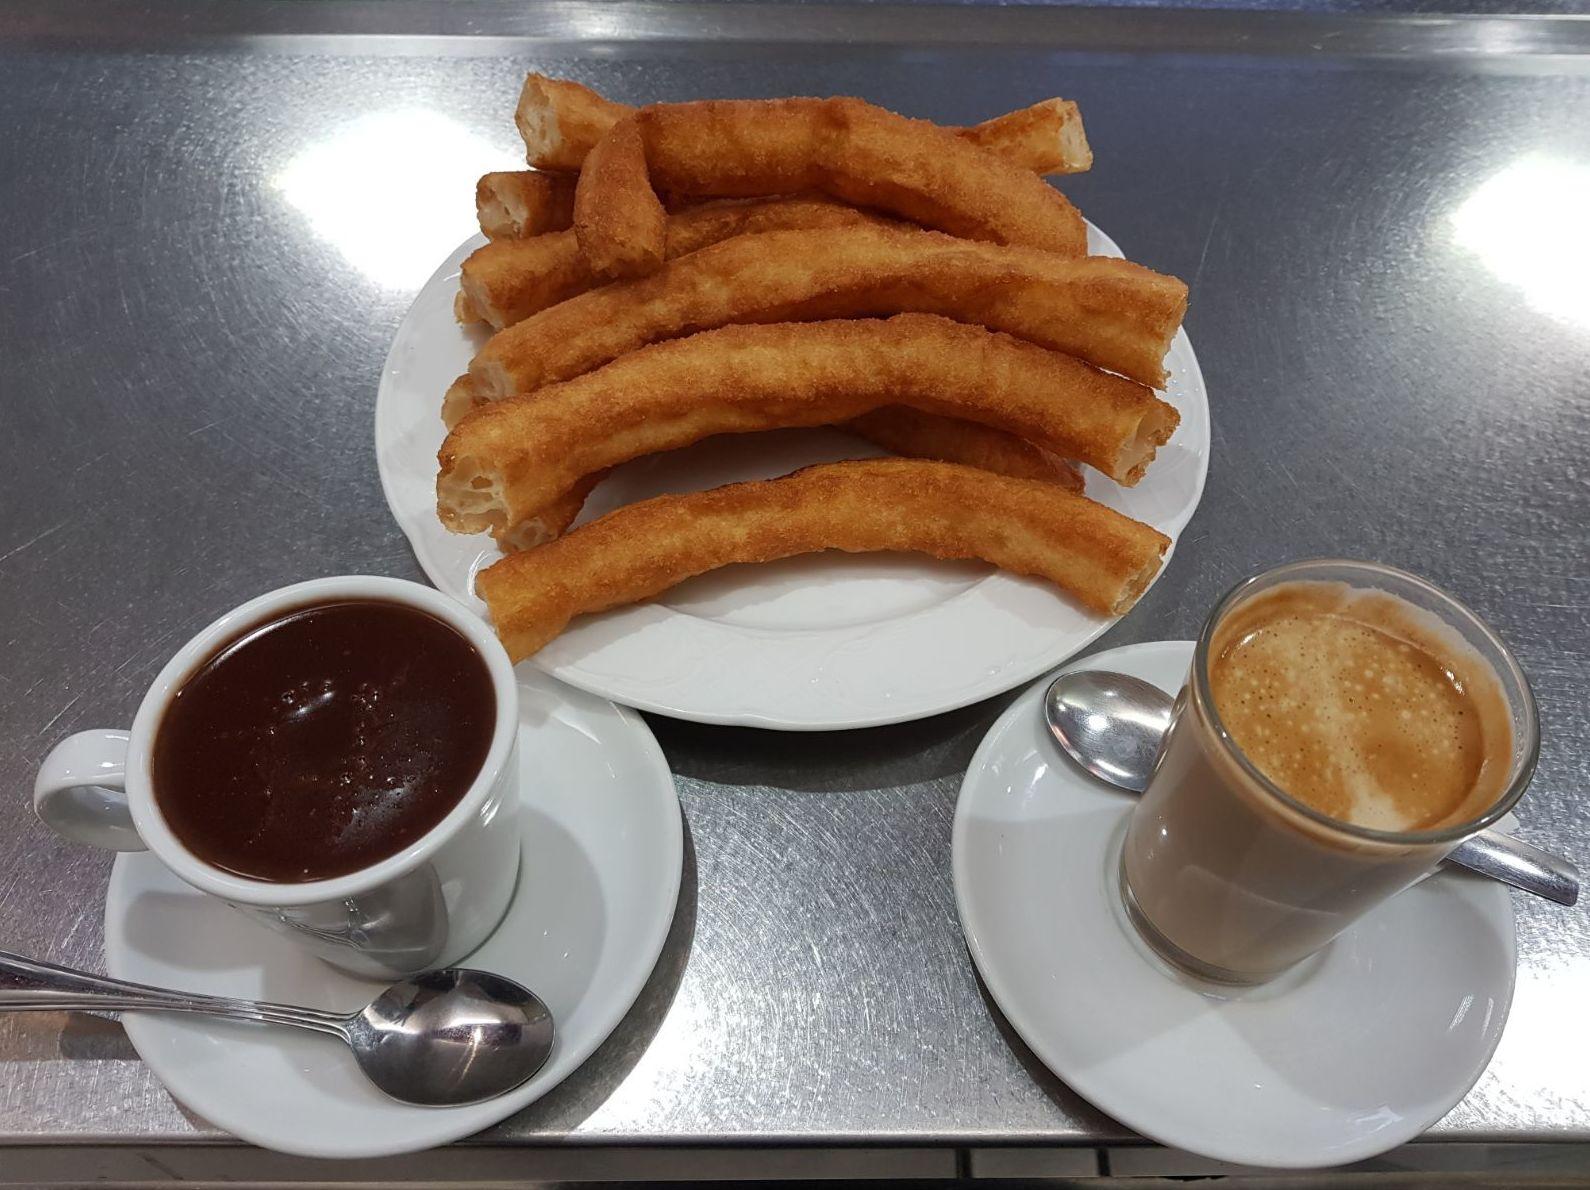 chocolate con churros Viladecans  BAR CHURRERÍA D'TAPAS